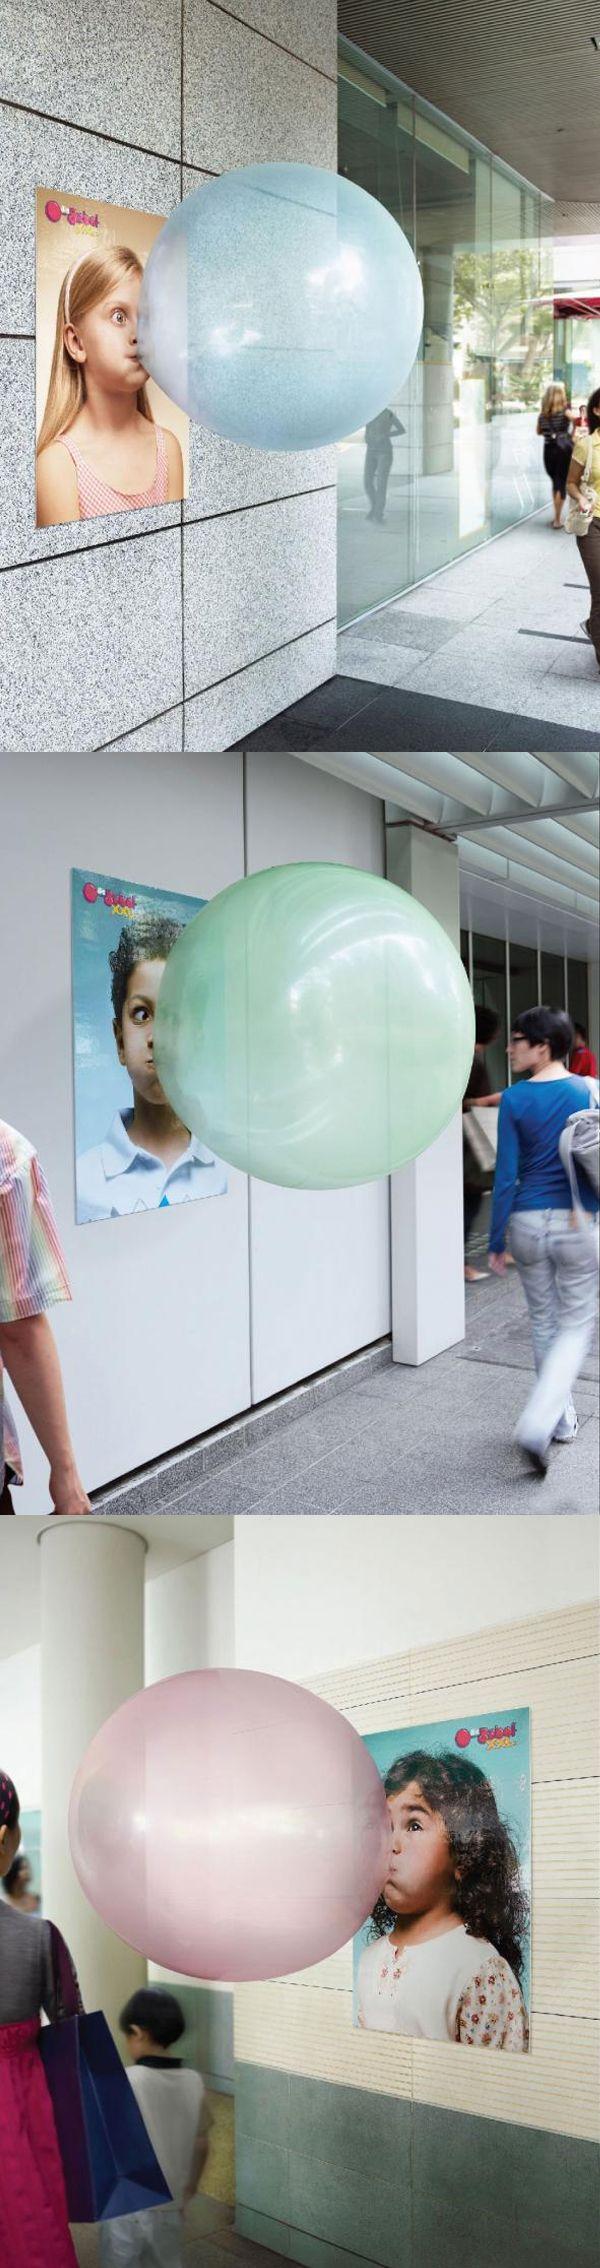 Yepp, so wird durch 'Guerillamarketing sogar Außenwerbung wieder spannend! for any photo editing : www.clippingpathlab.com